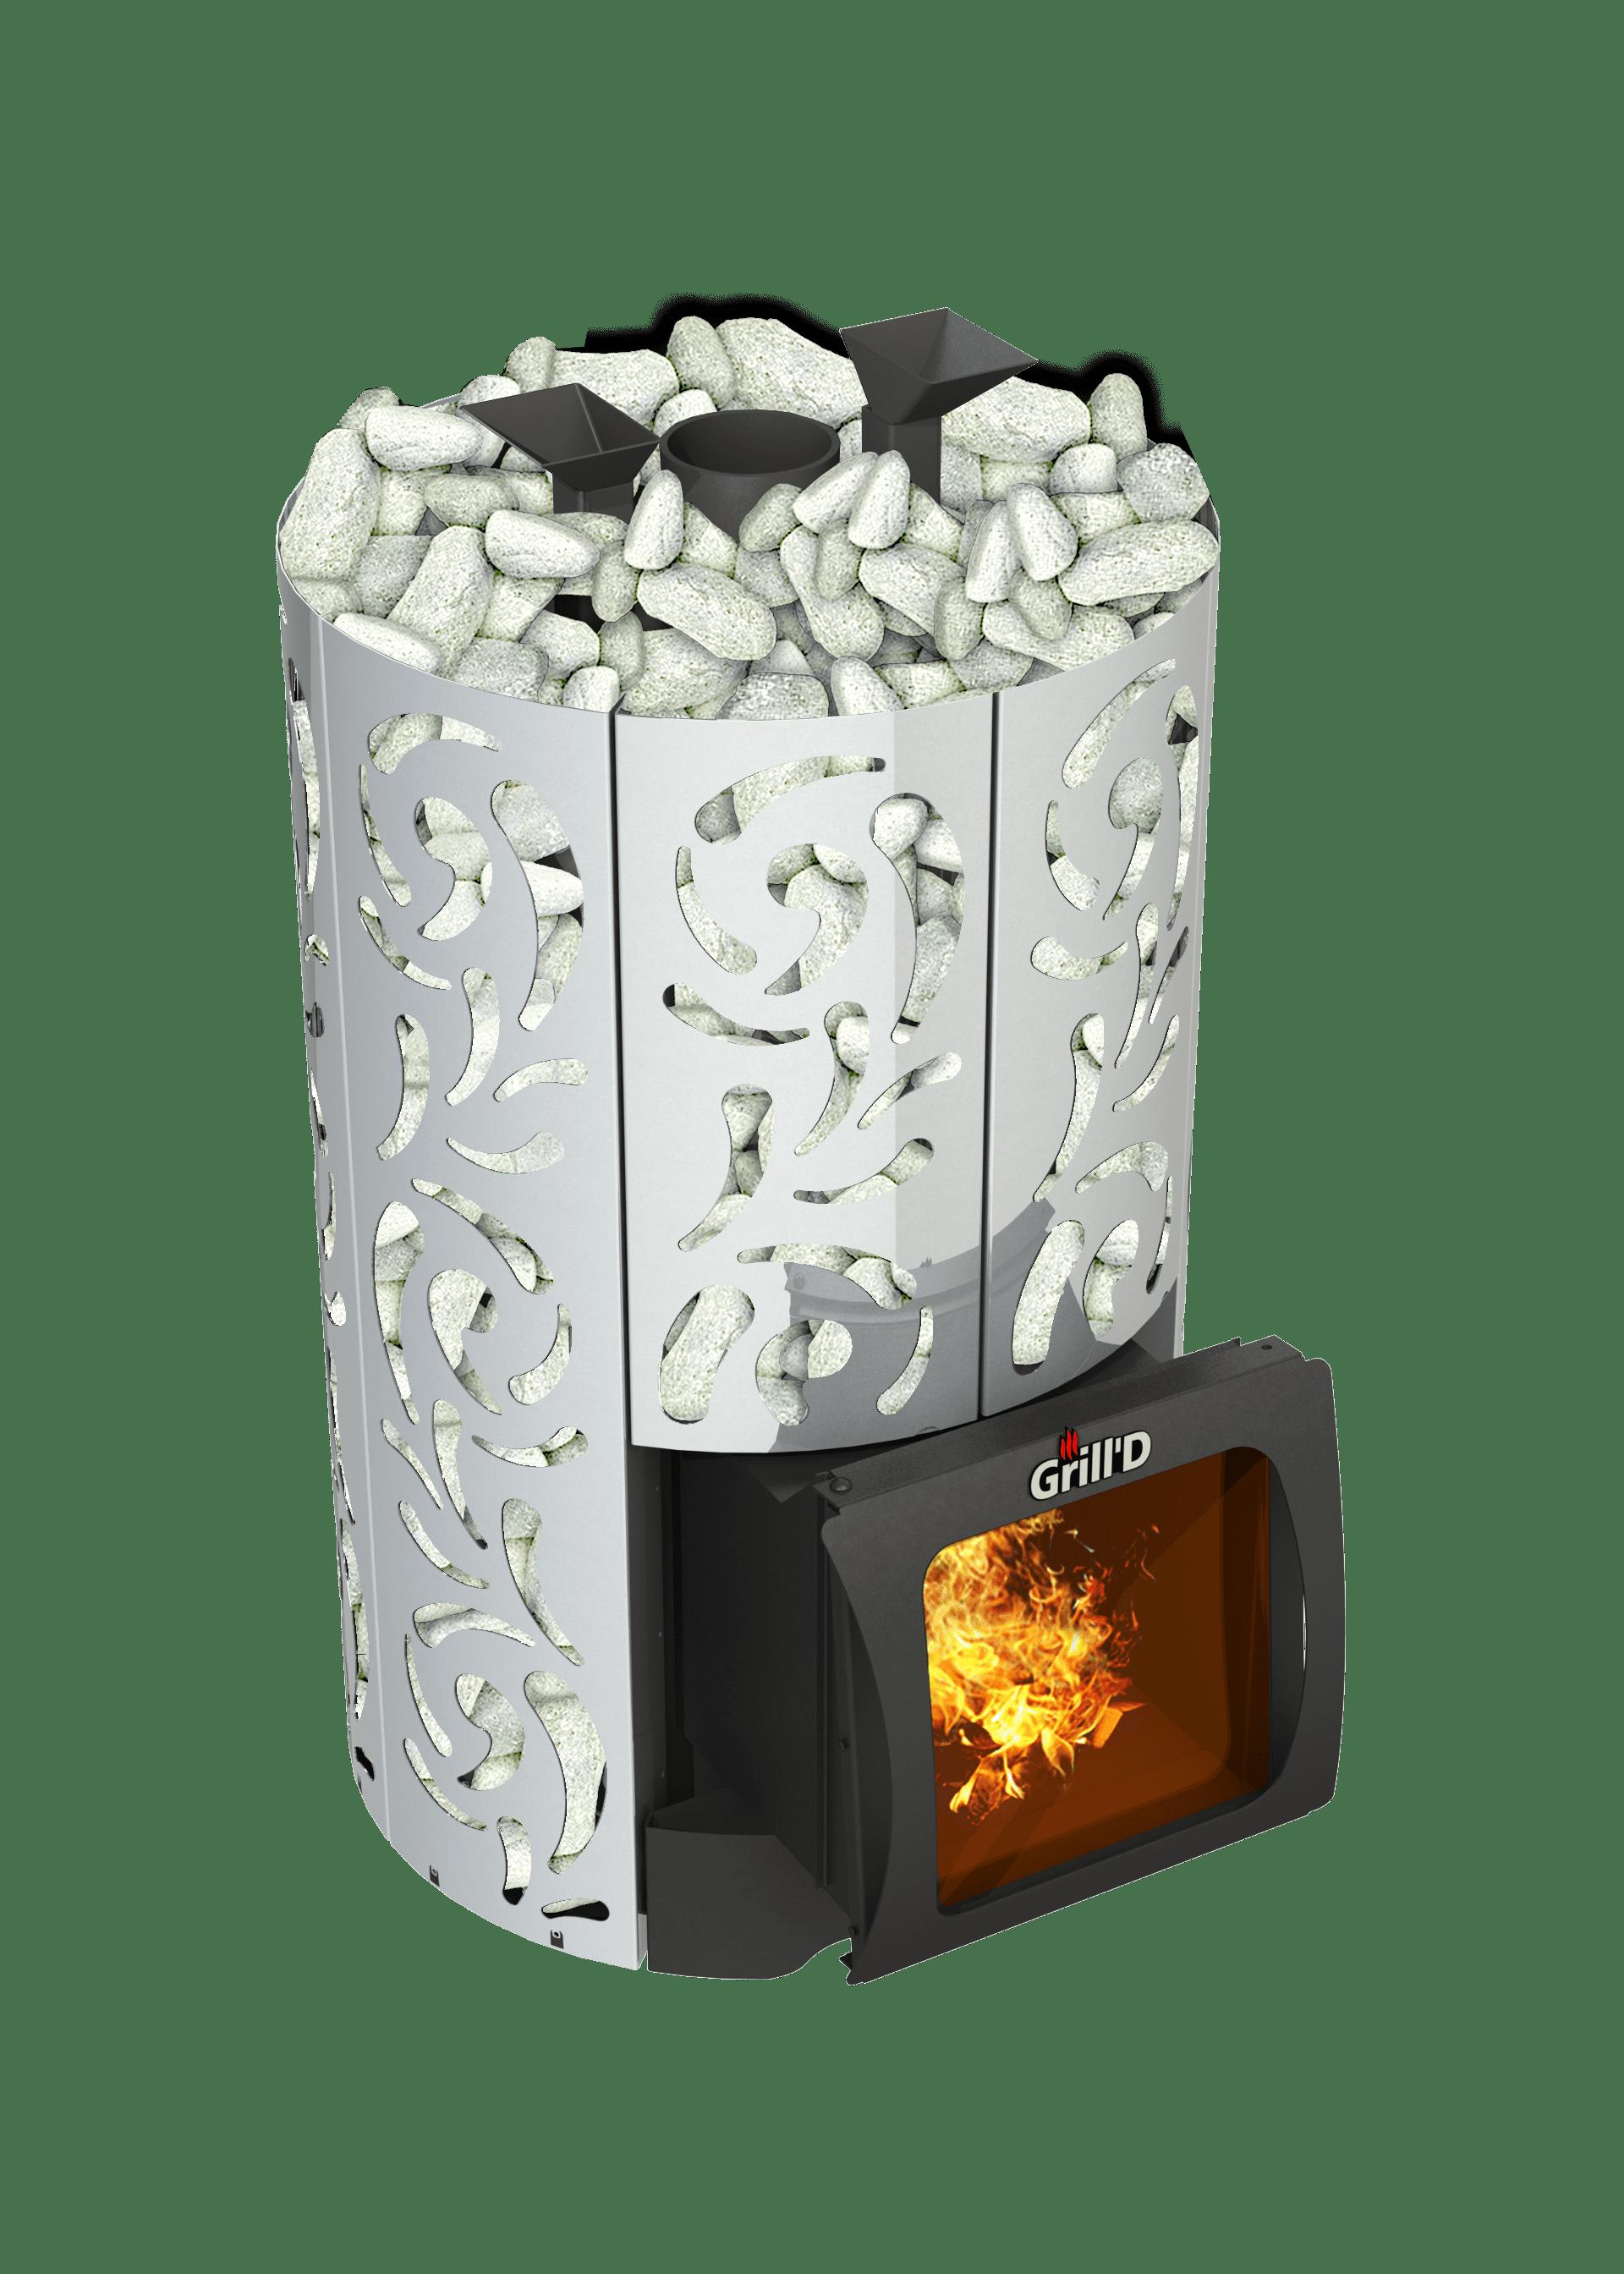 Банная печь Grill'D Violet World Steel Short Window Max (Жадеит 170 кг)